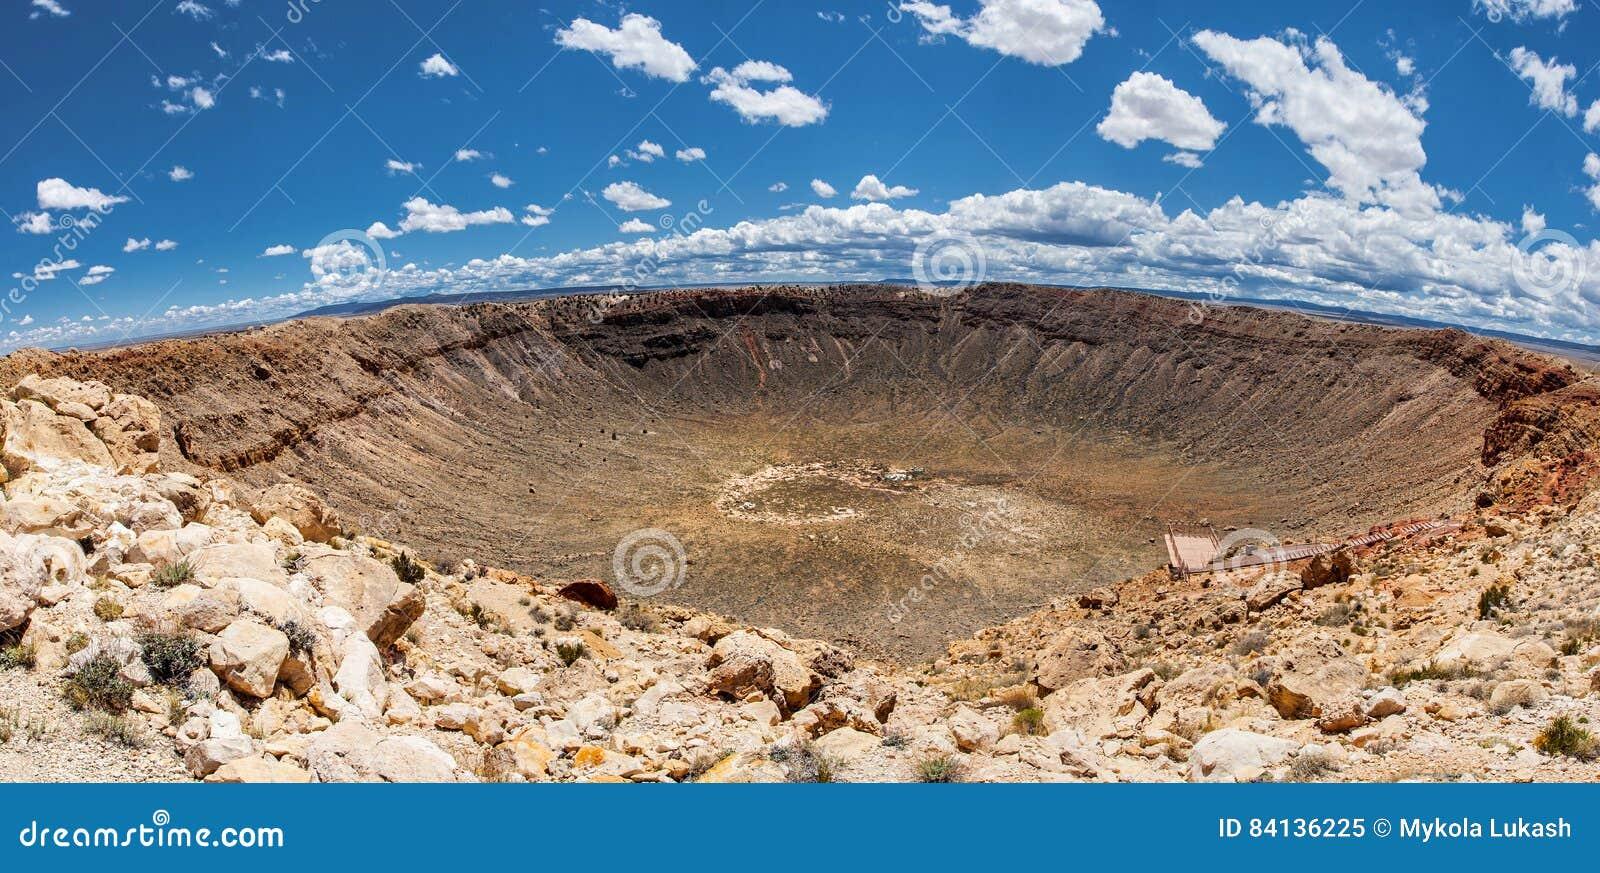 Vista panorâmica da cratera do meteoro, em Winslow, o Arizona, EUA